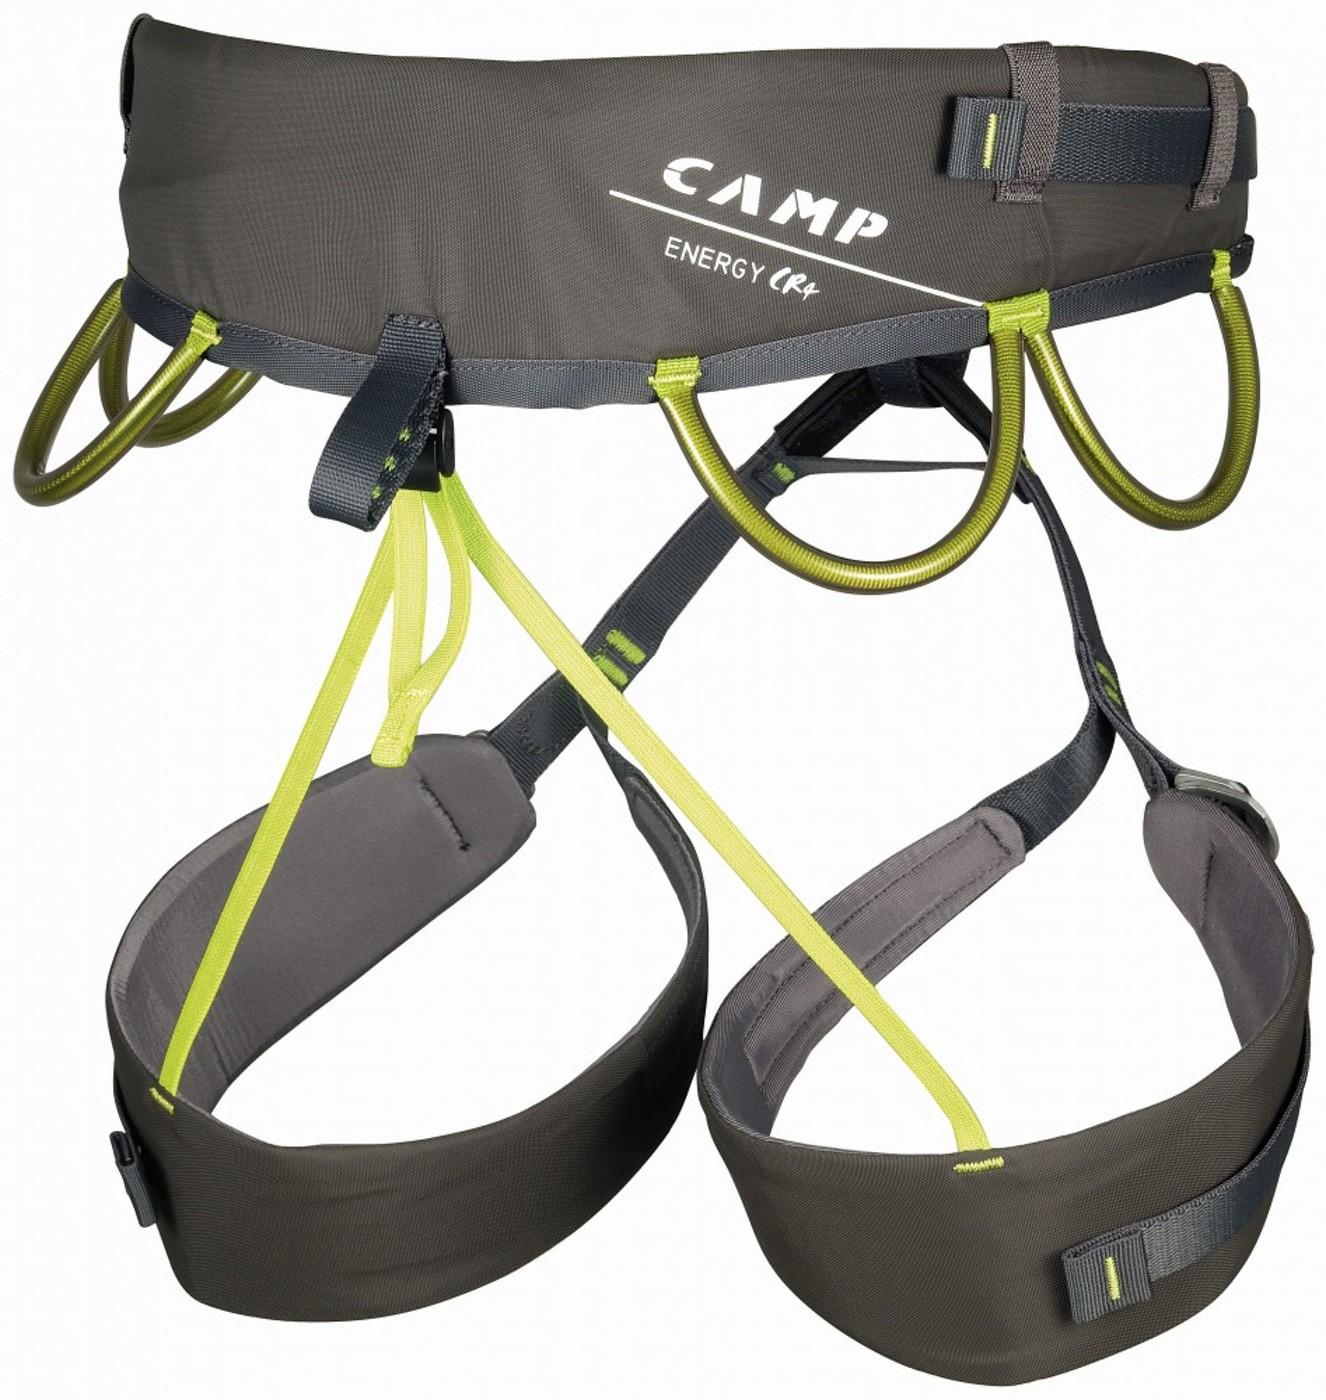 CAMP ENERGY CR 4